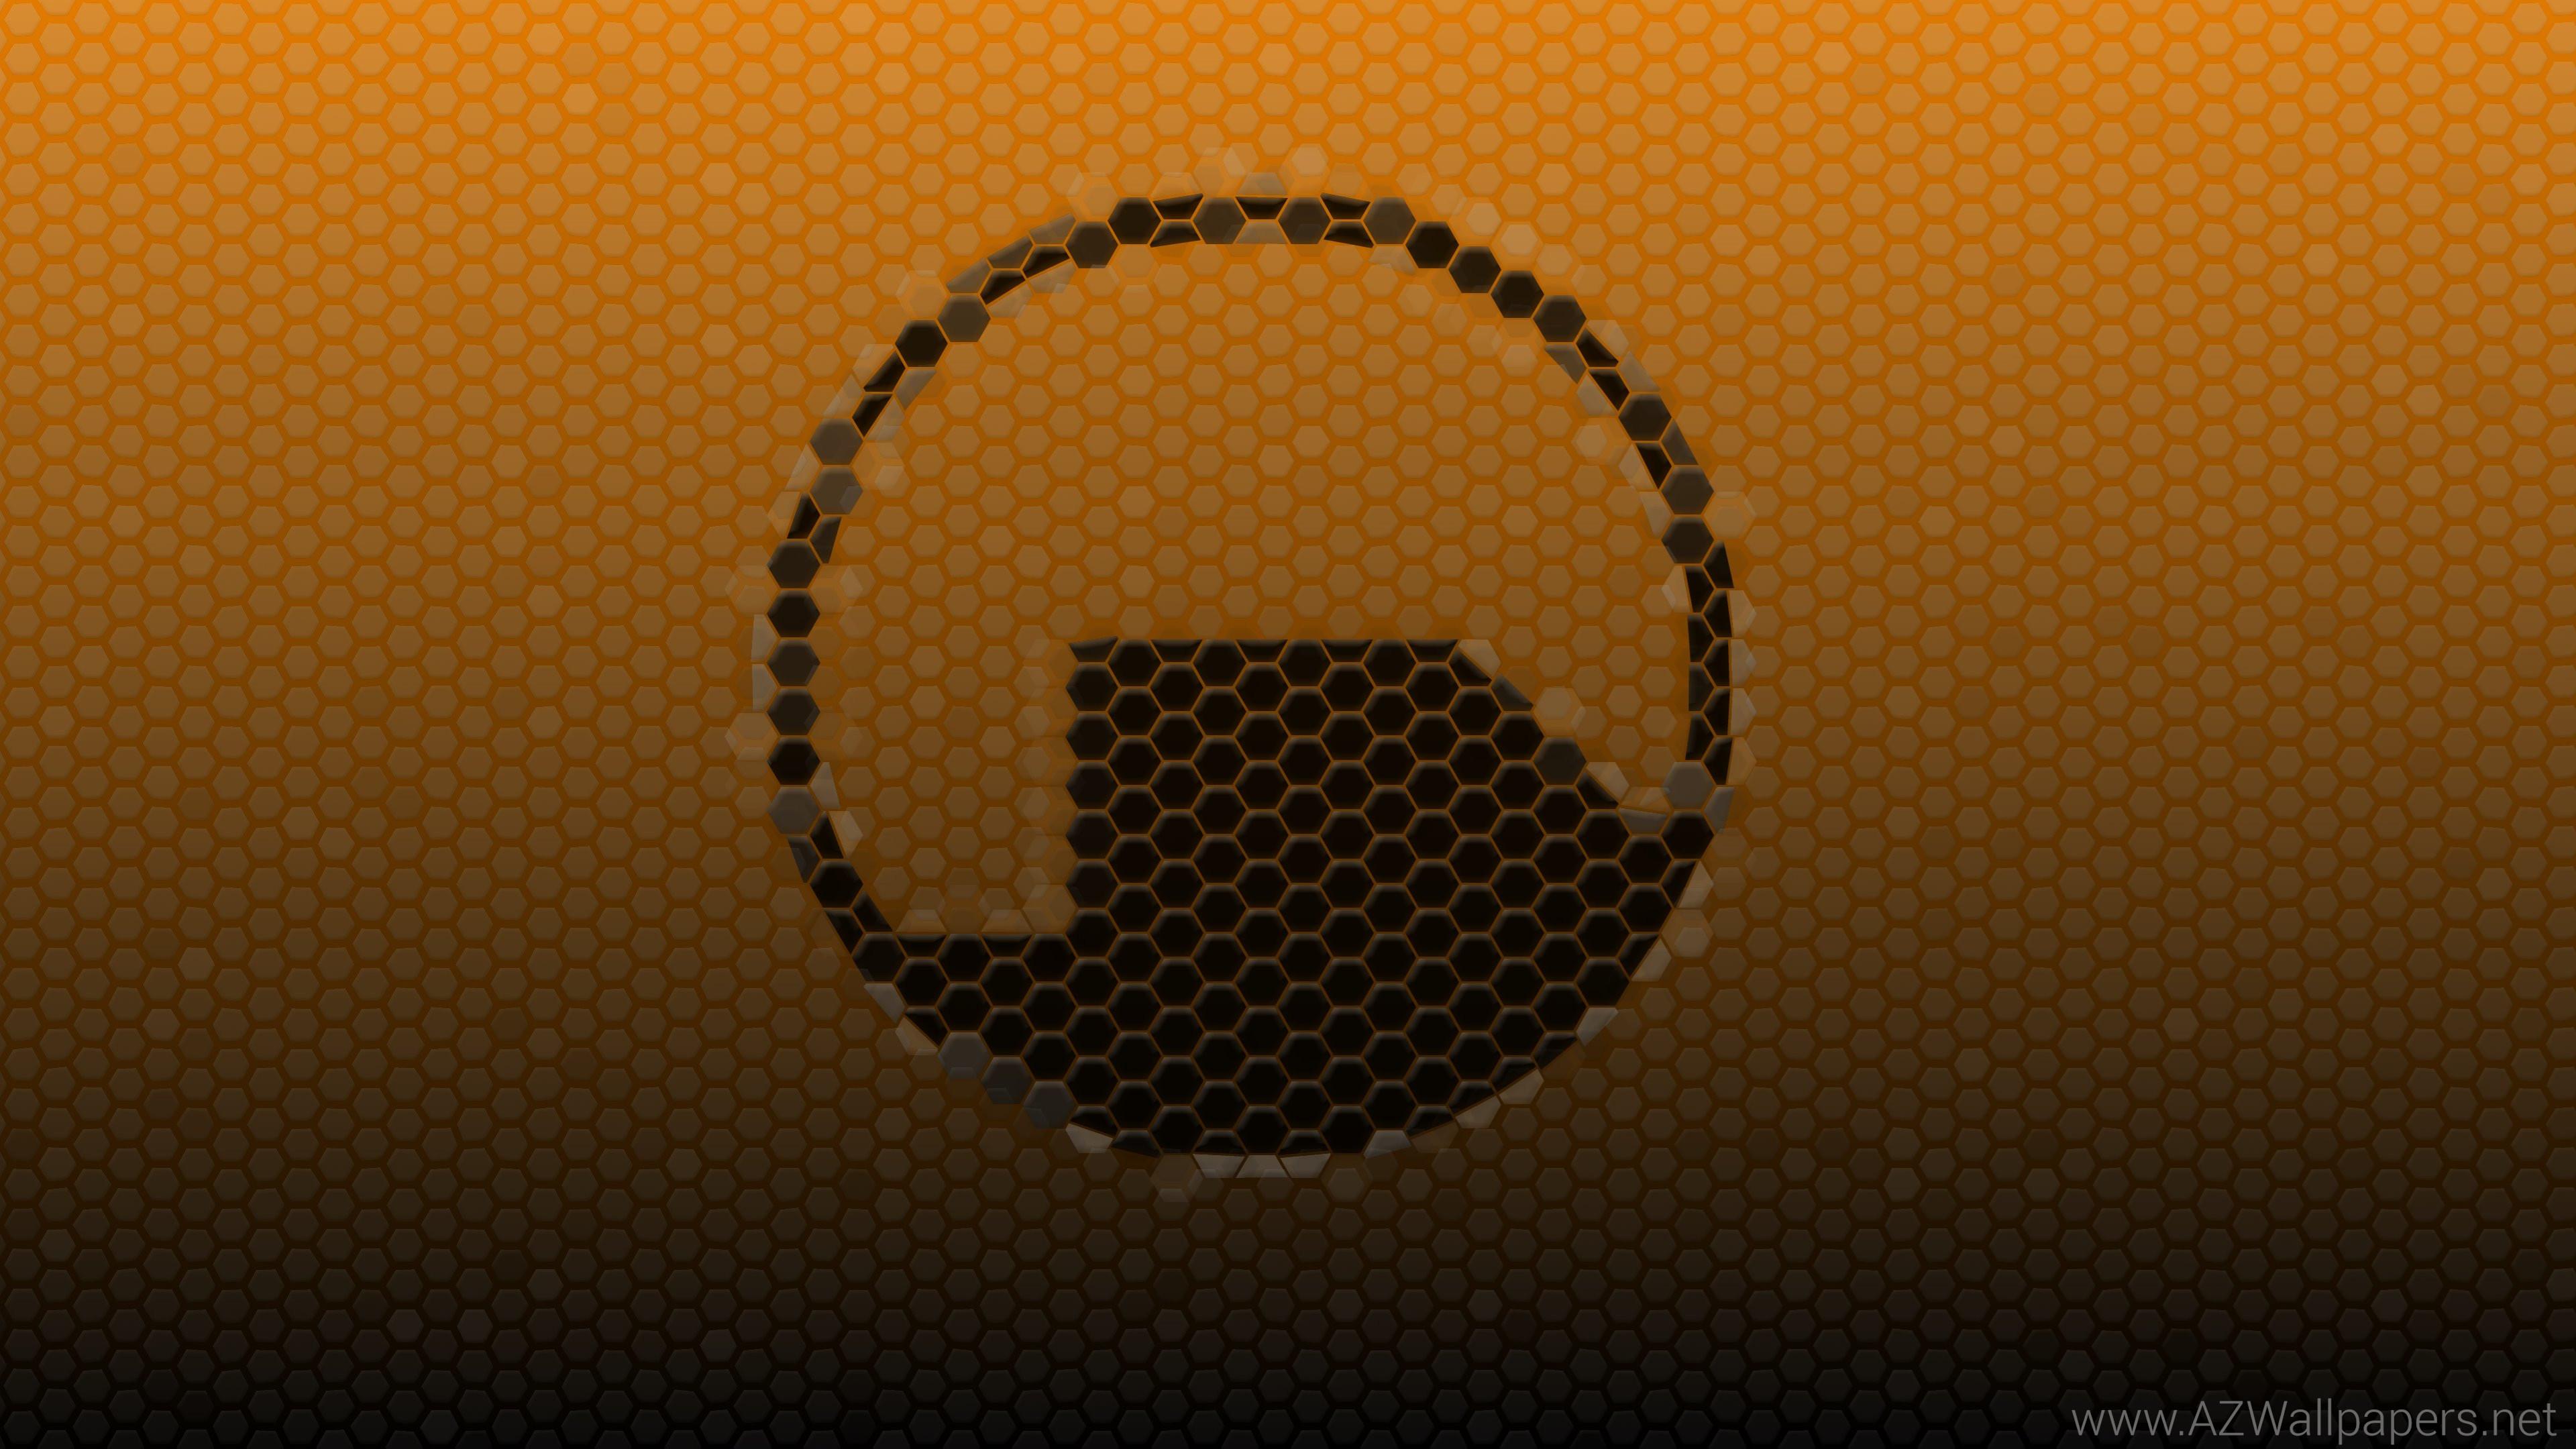 Black Mesa Wallpapers By TrueVelox On DeviantArt